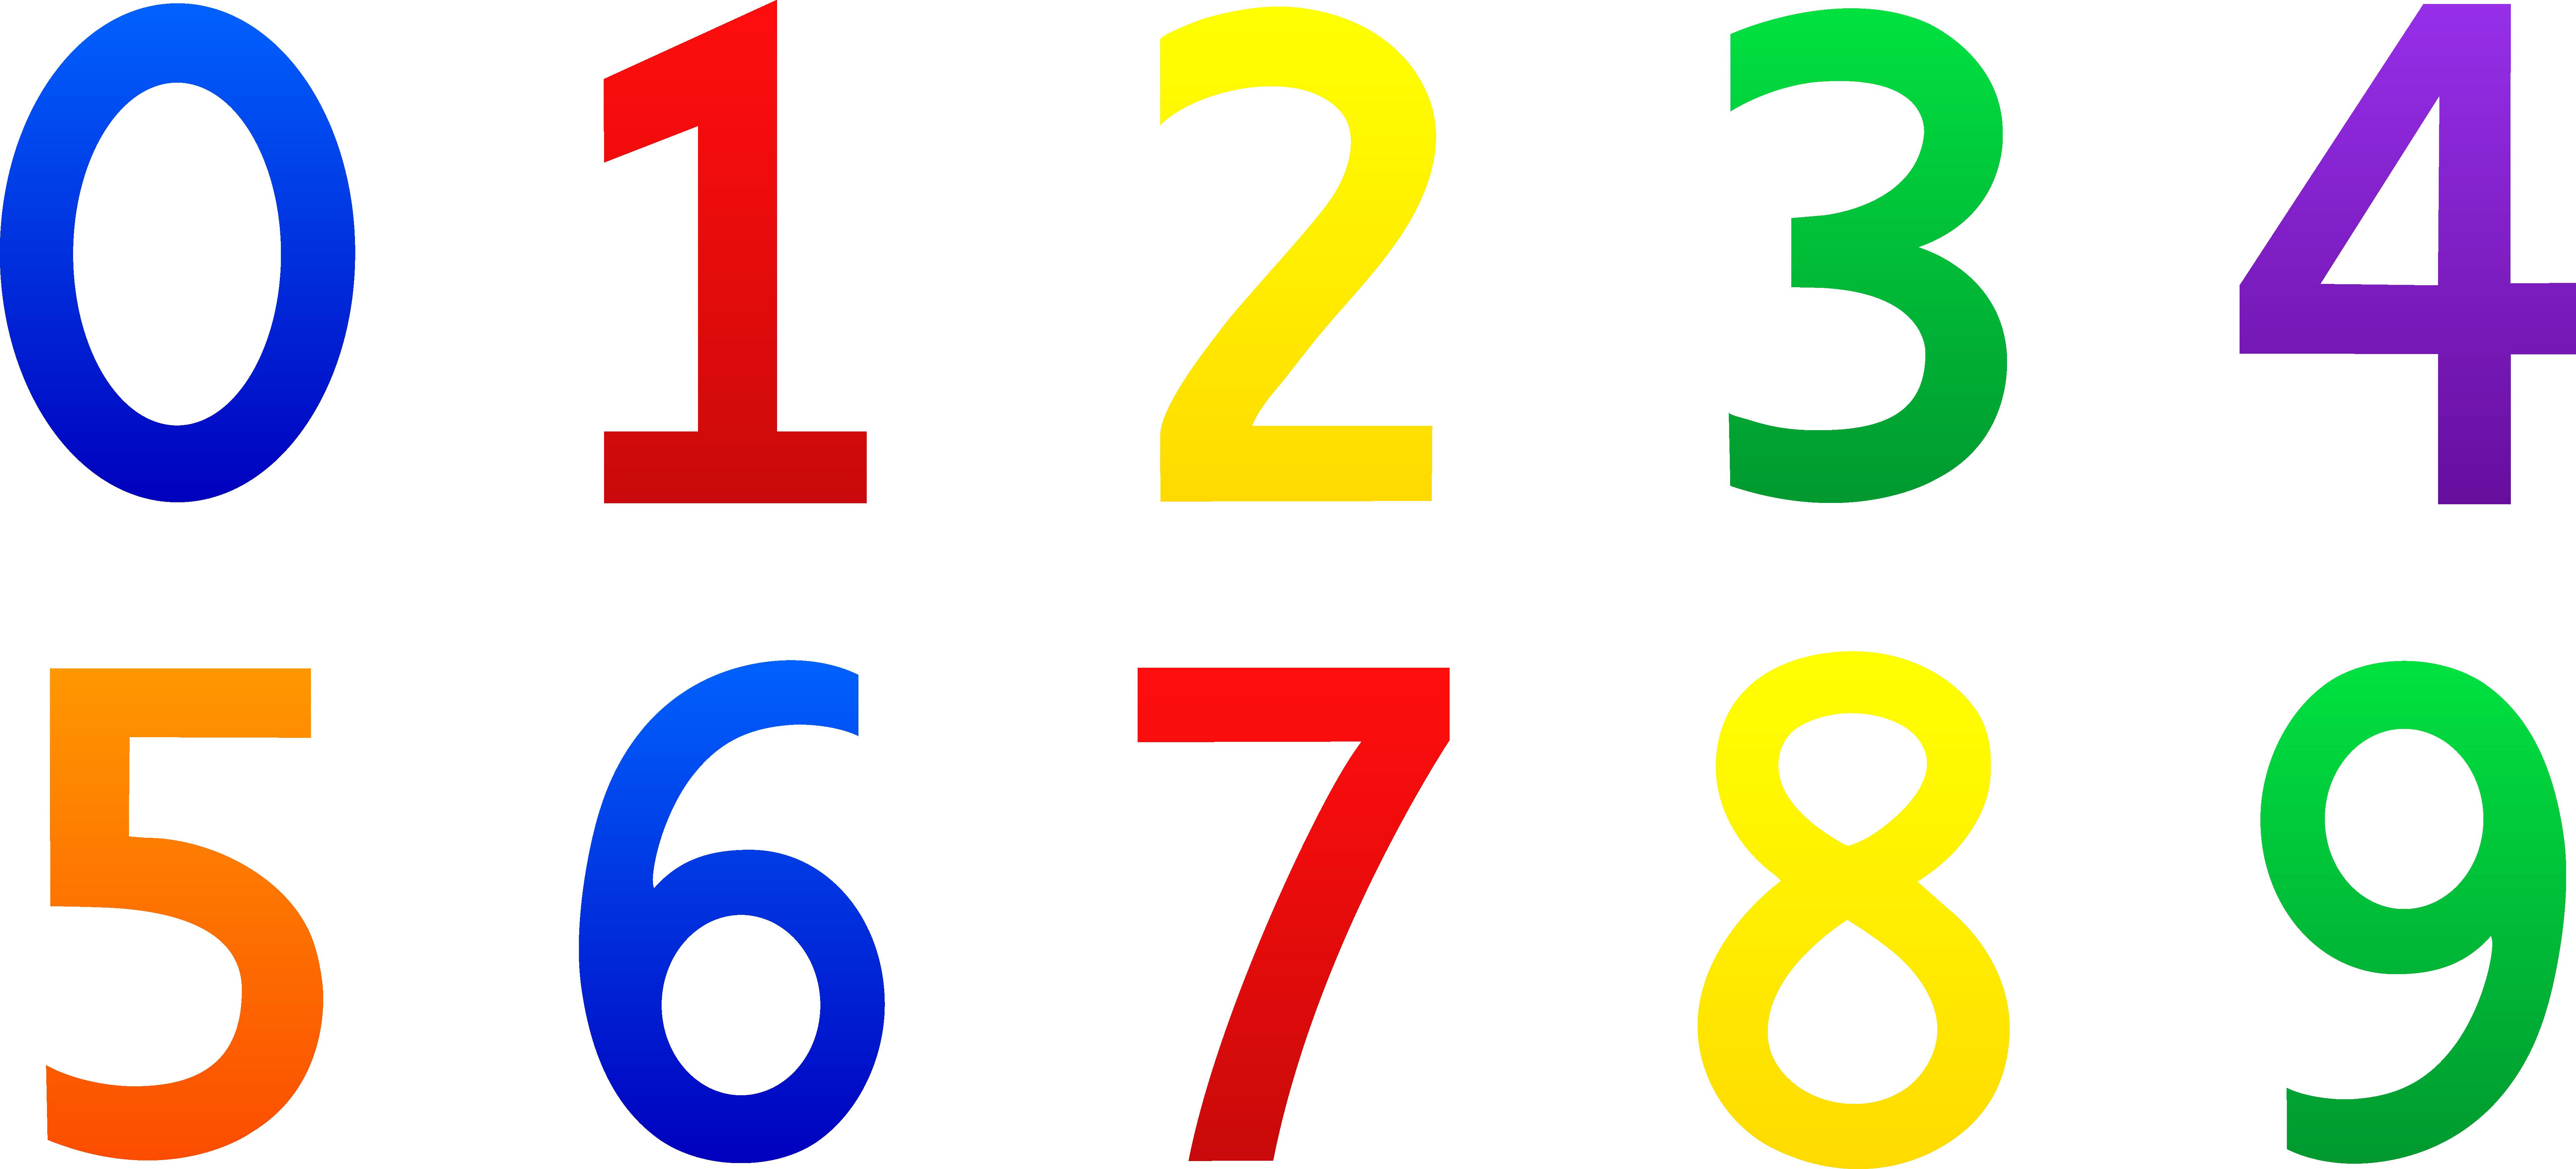 7787x3533 Free Clip Art Numbers 1 10 Numbers Clip Art 1 10 Alihkan.us